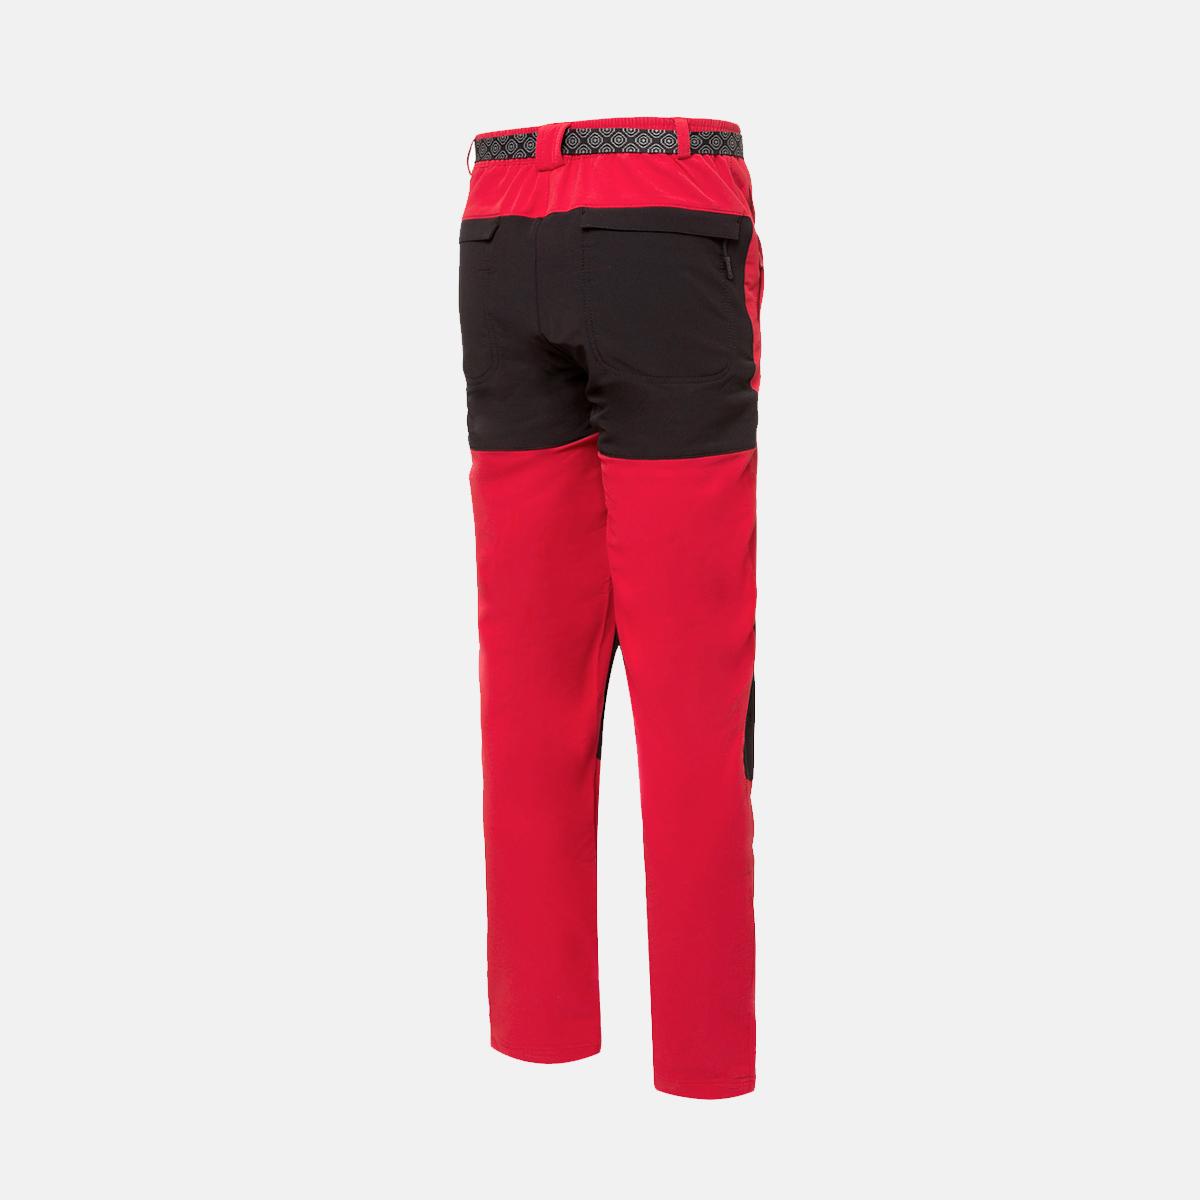 MAN'S CHAMONIX STRETCH PANT RED